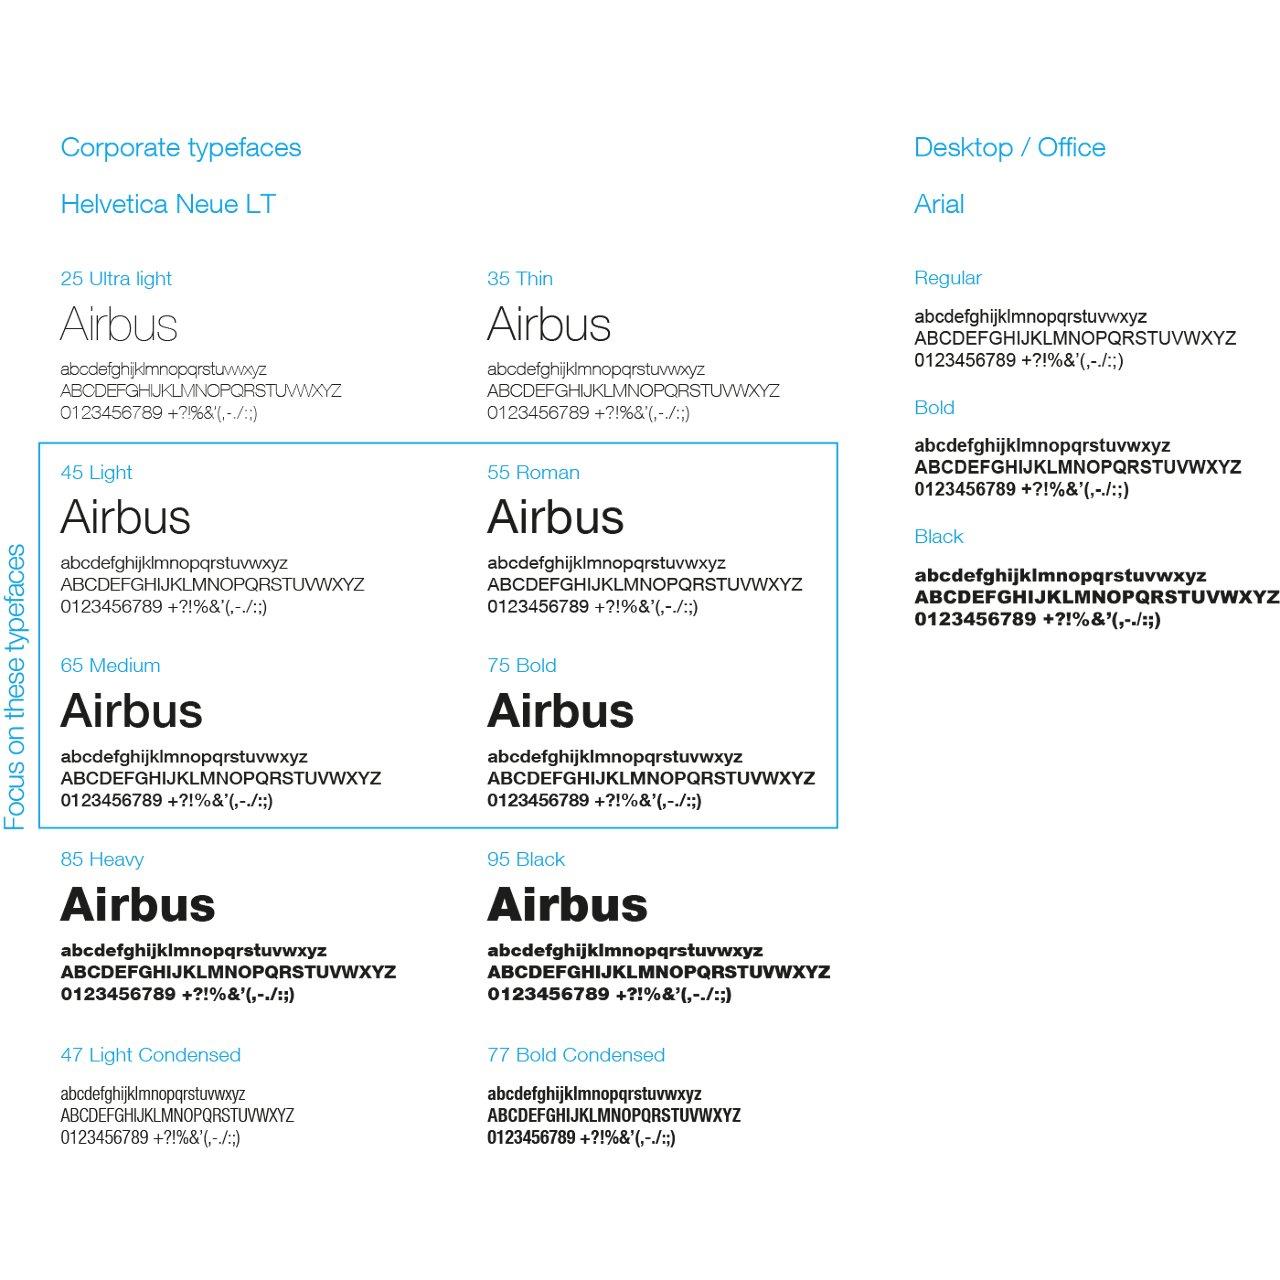 ACJ / ACH - Sub-brands